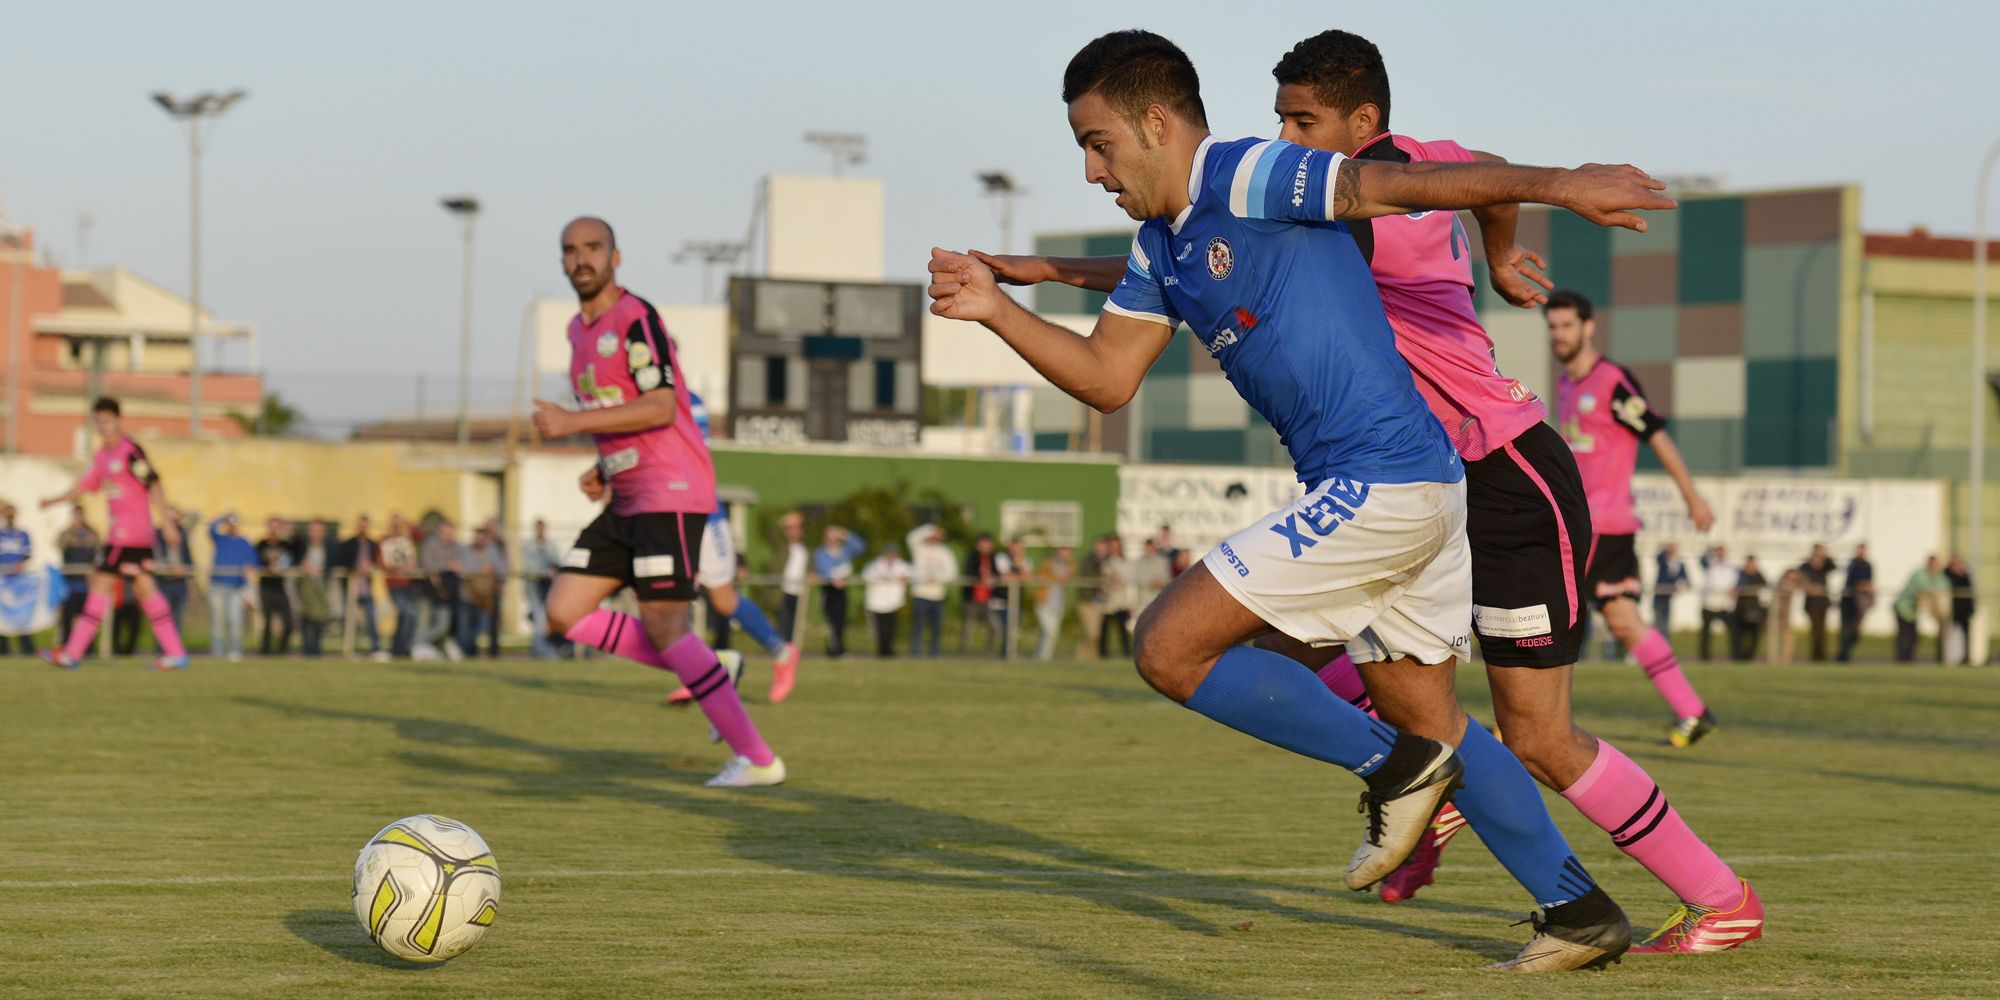 Xerez DFC - Ciudad de Lucena, en partido disputado en Rota como local, 13NOV2016 | Cristobal Dueñas/AFC